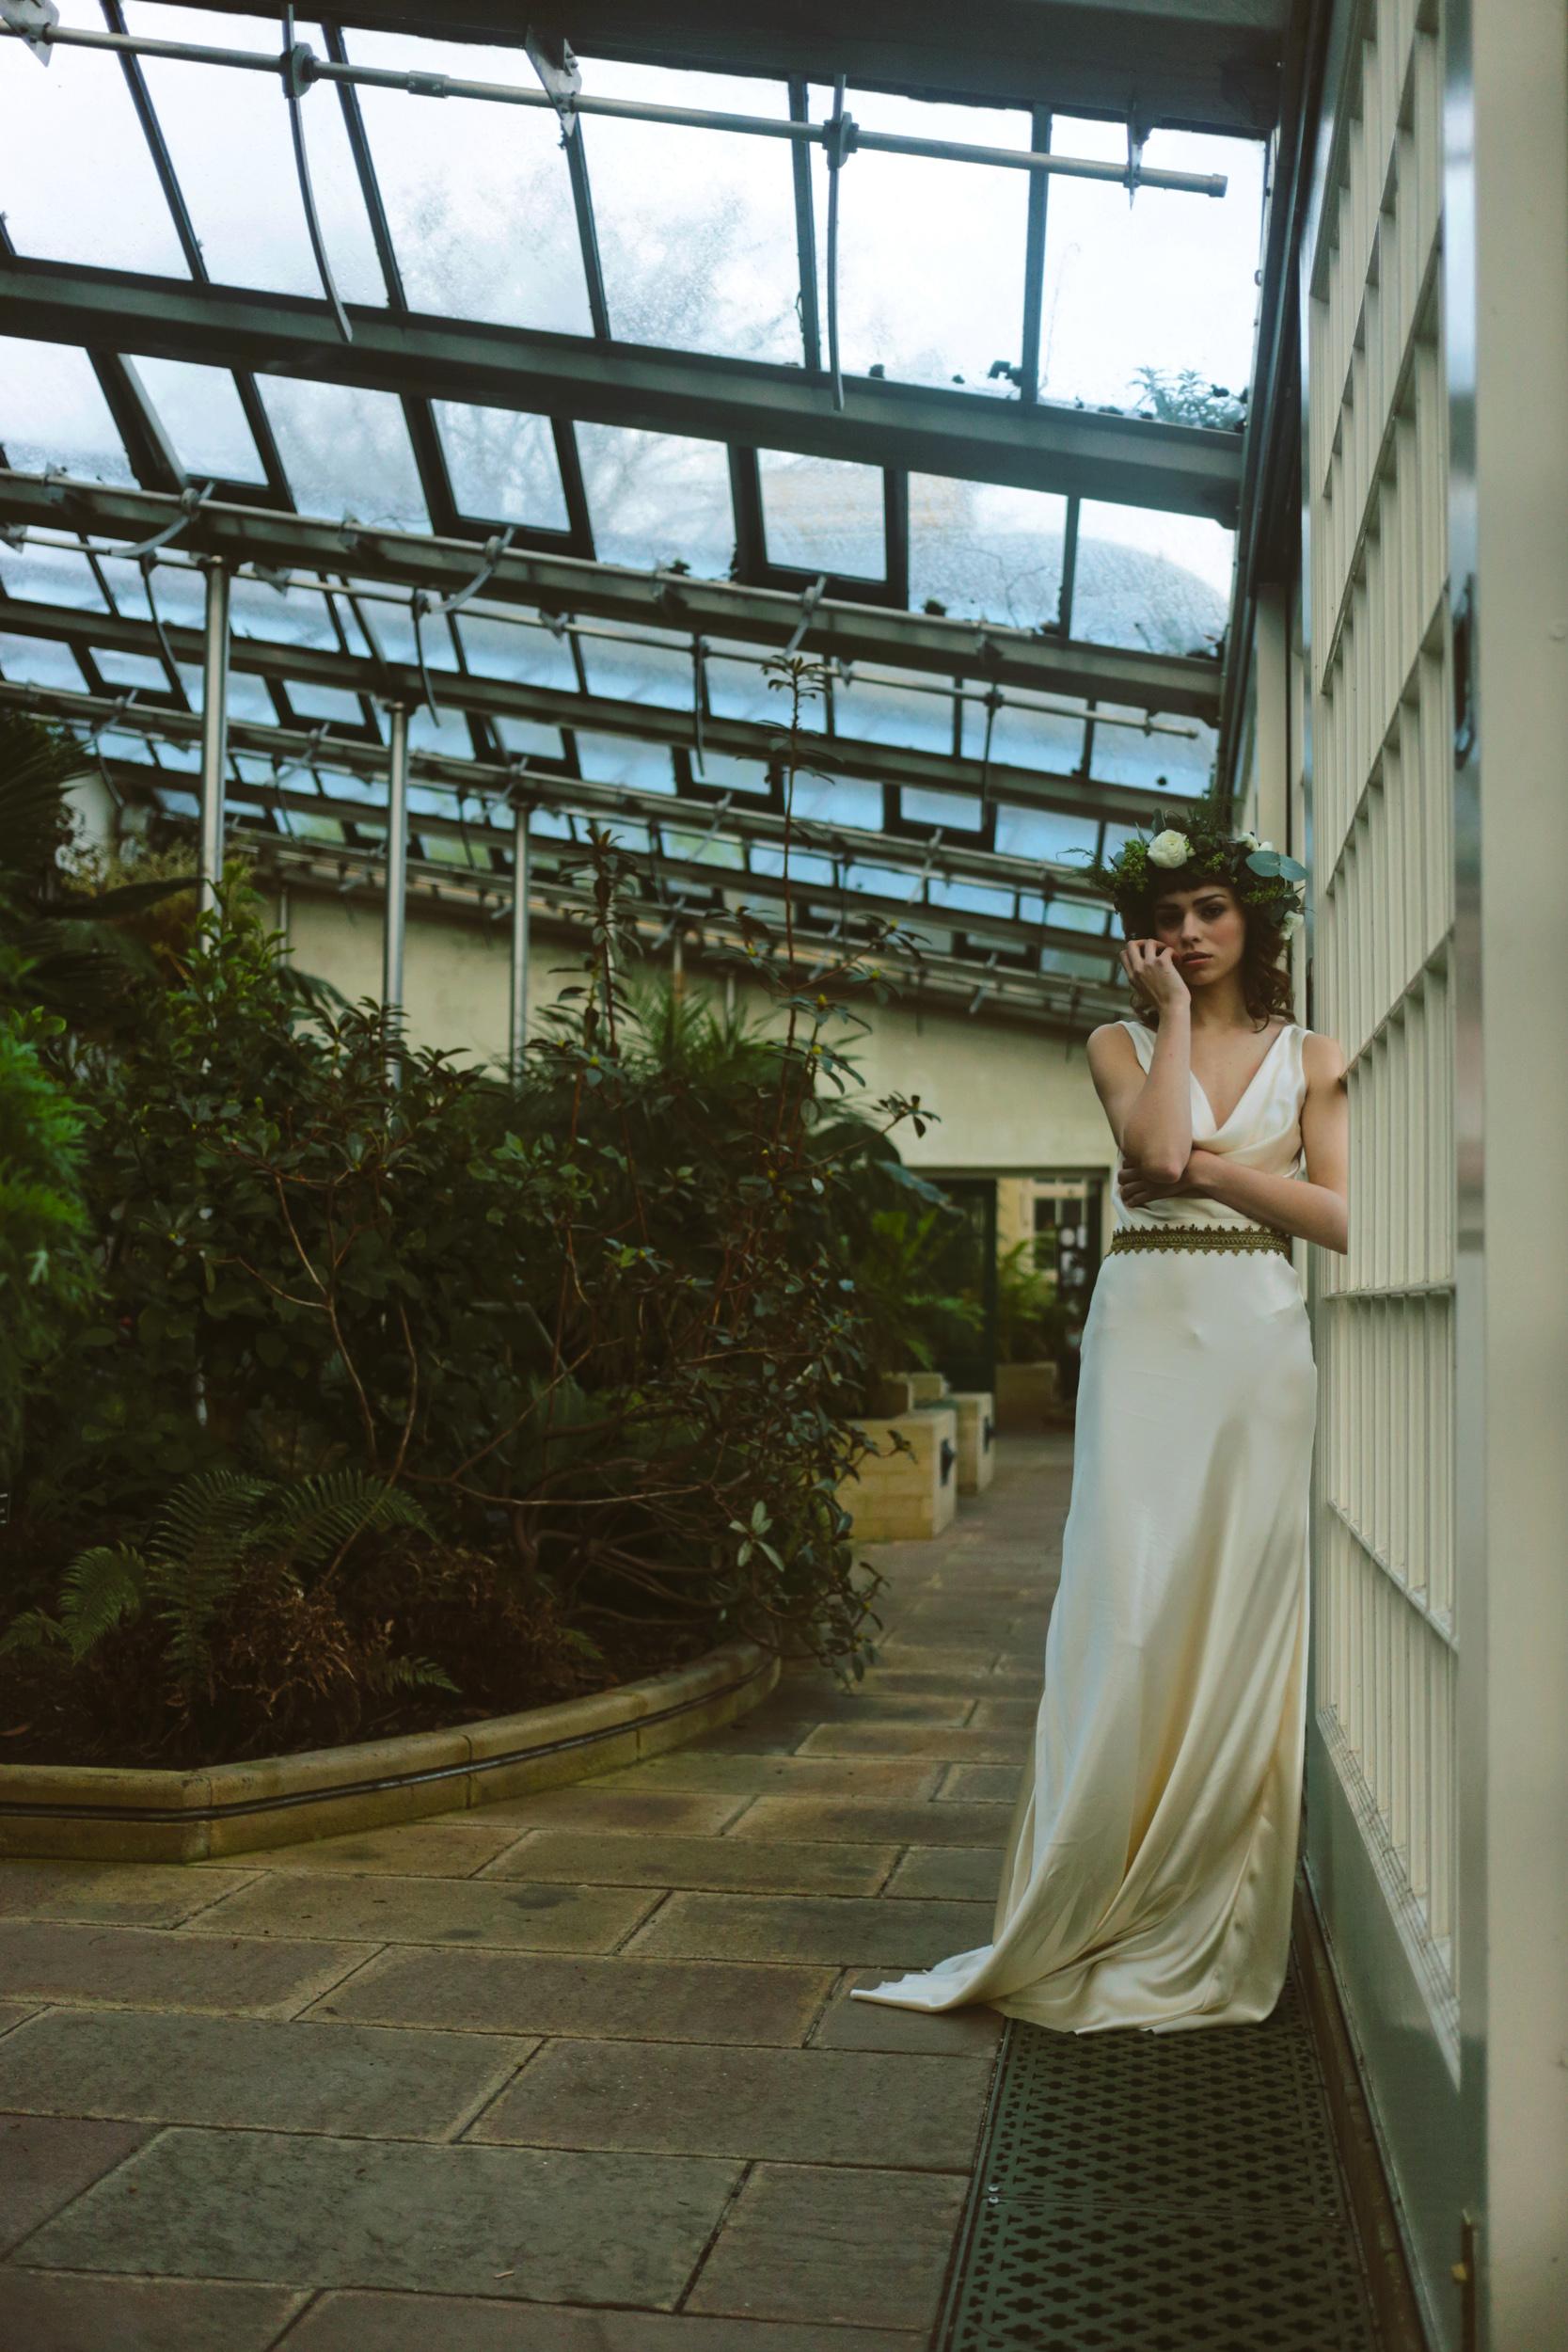 Winter-Bridal-Kate-Beaumont-Shelley-Richmond-Vintage-Wedding-Dress-11.jpg